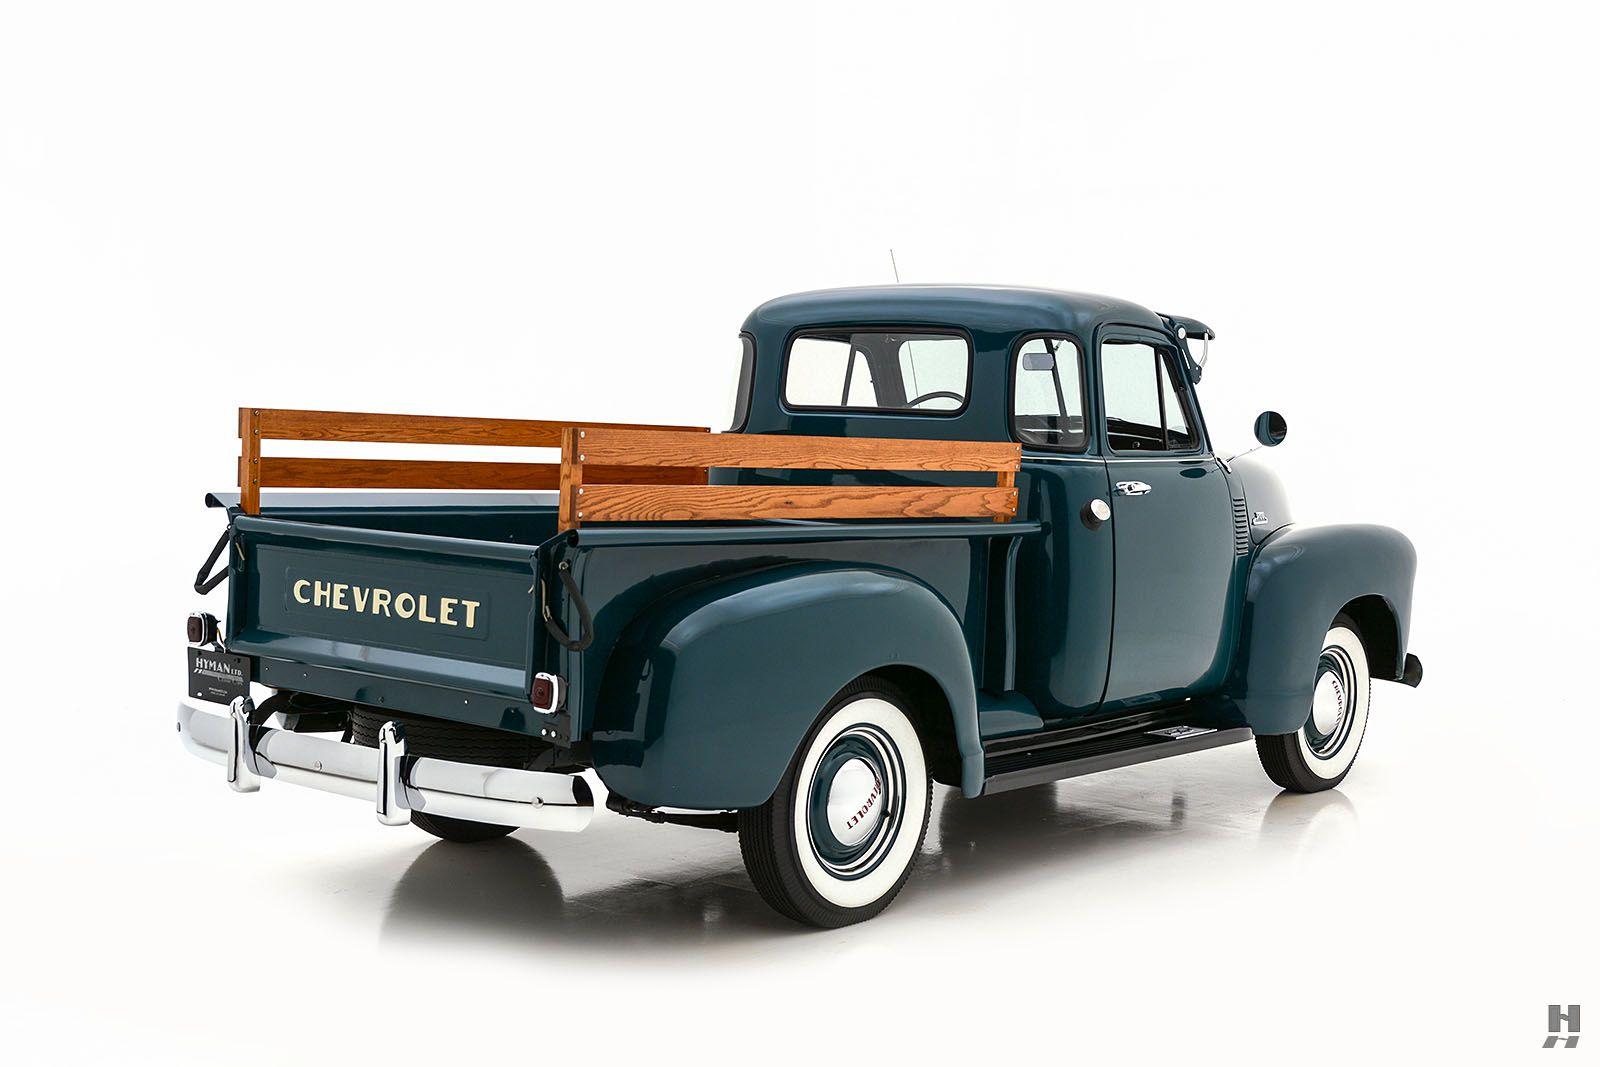 1953 Chevrolet 3100 Pickup Cars Trucks Chevrolet 3100 Antique Cars